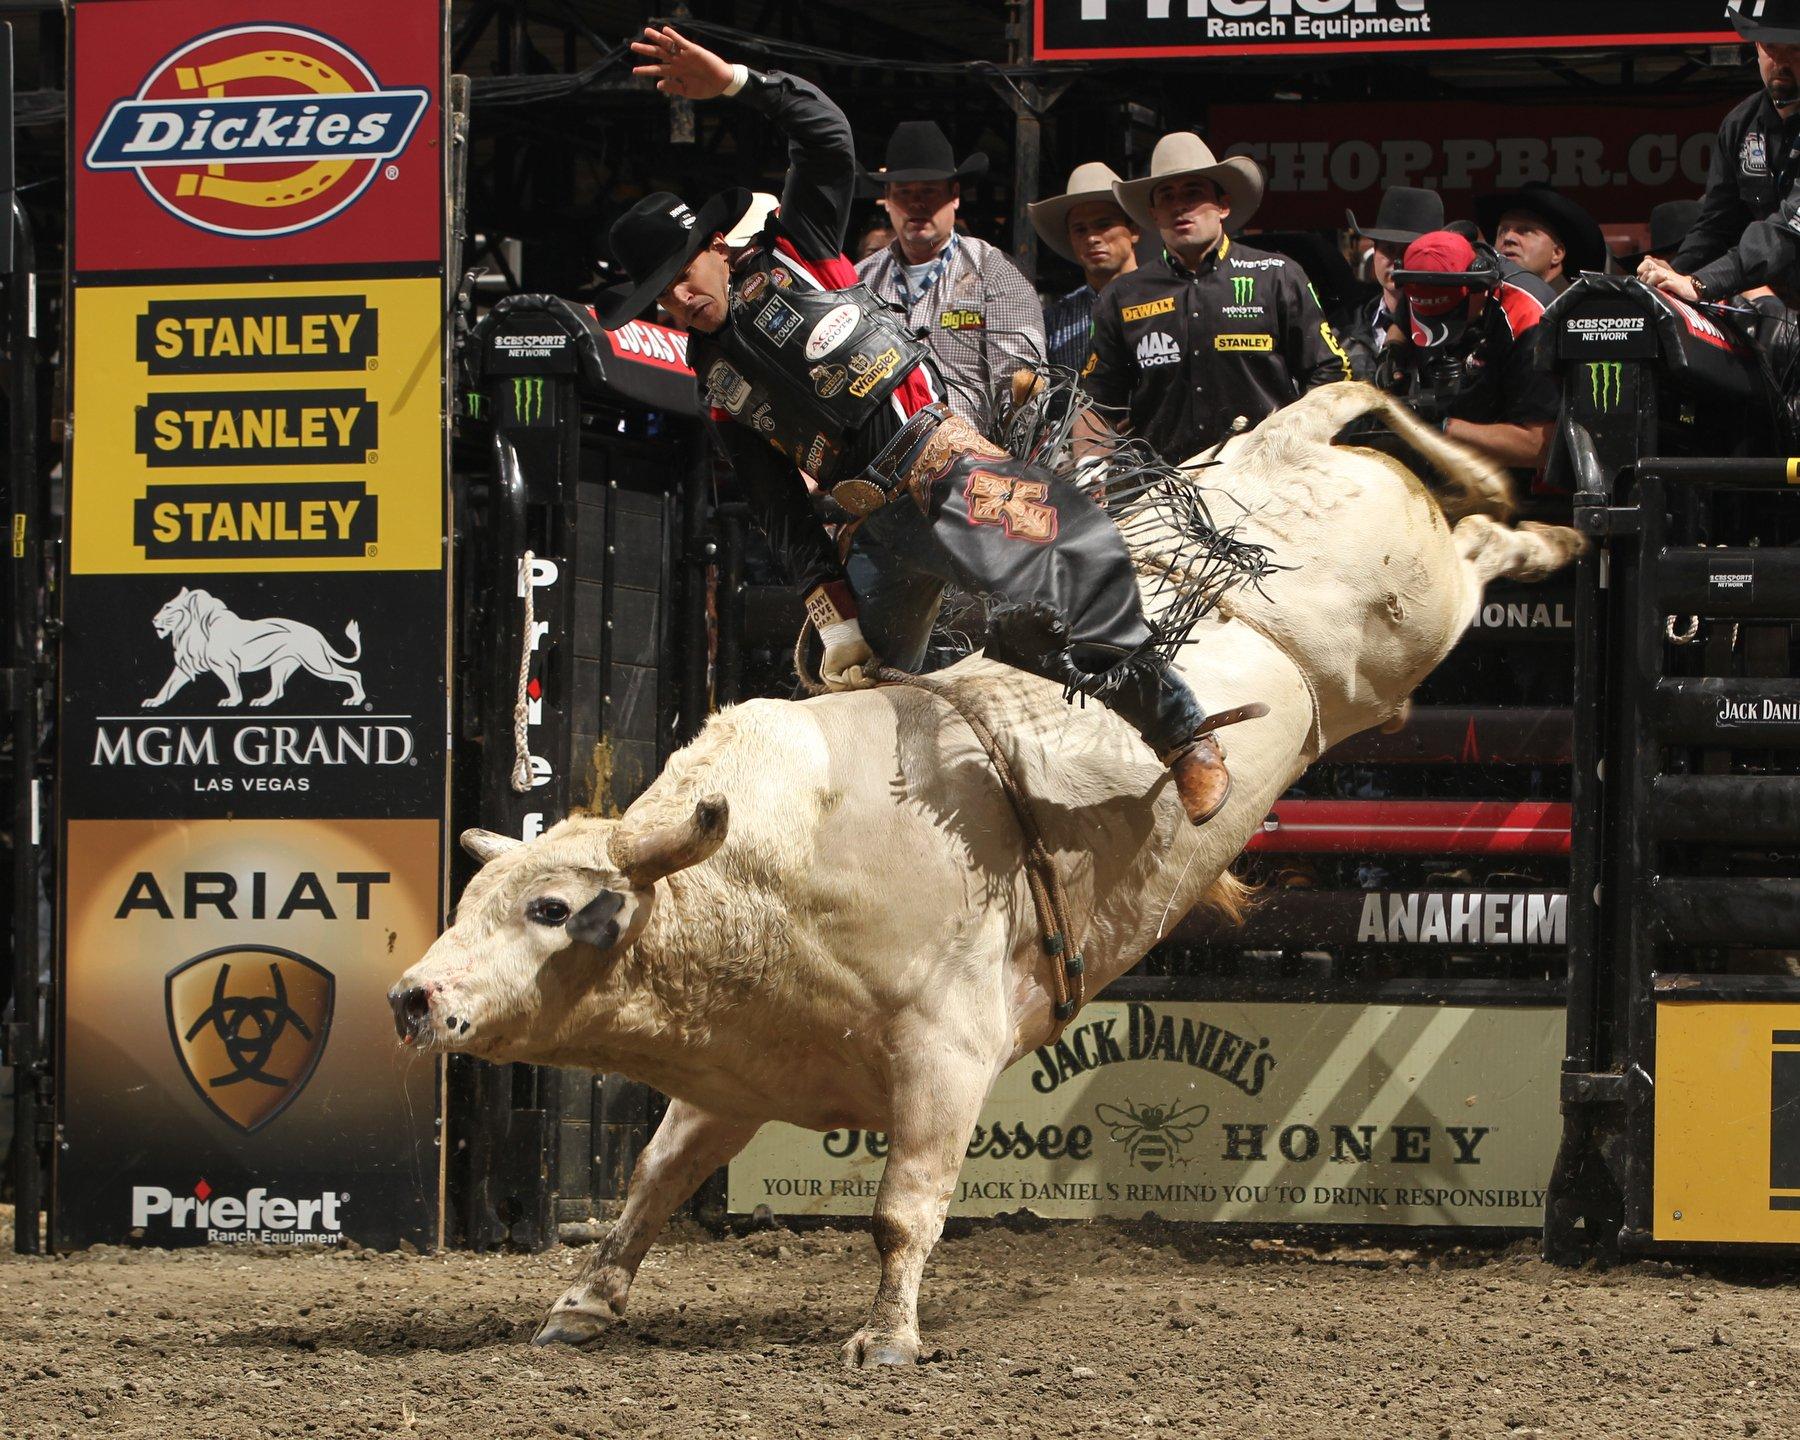 Bull riding bullrider rodeo western cowboy extreme cow 11 jpg wallpaper 1800x1440 298675 - Bull riding wallpapers ...